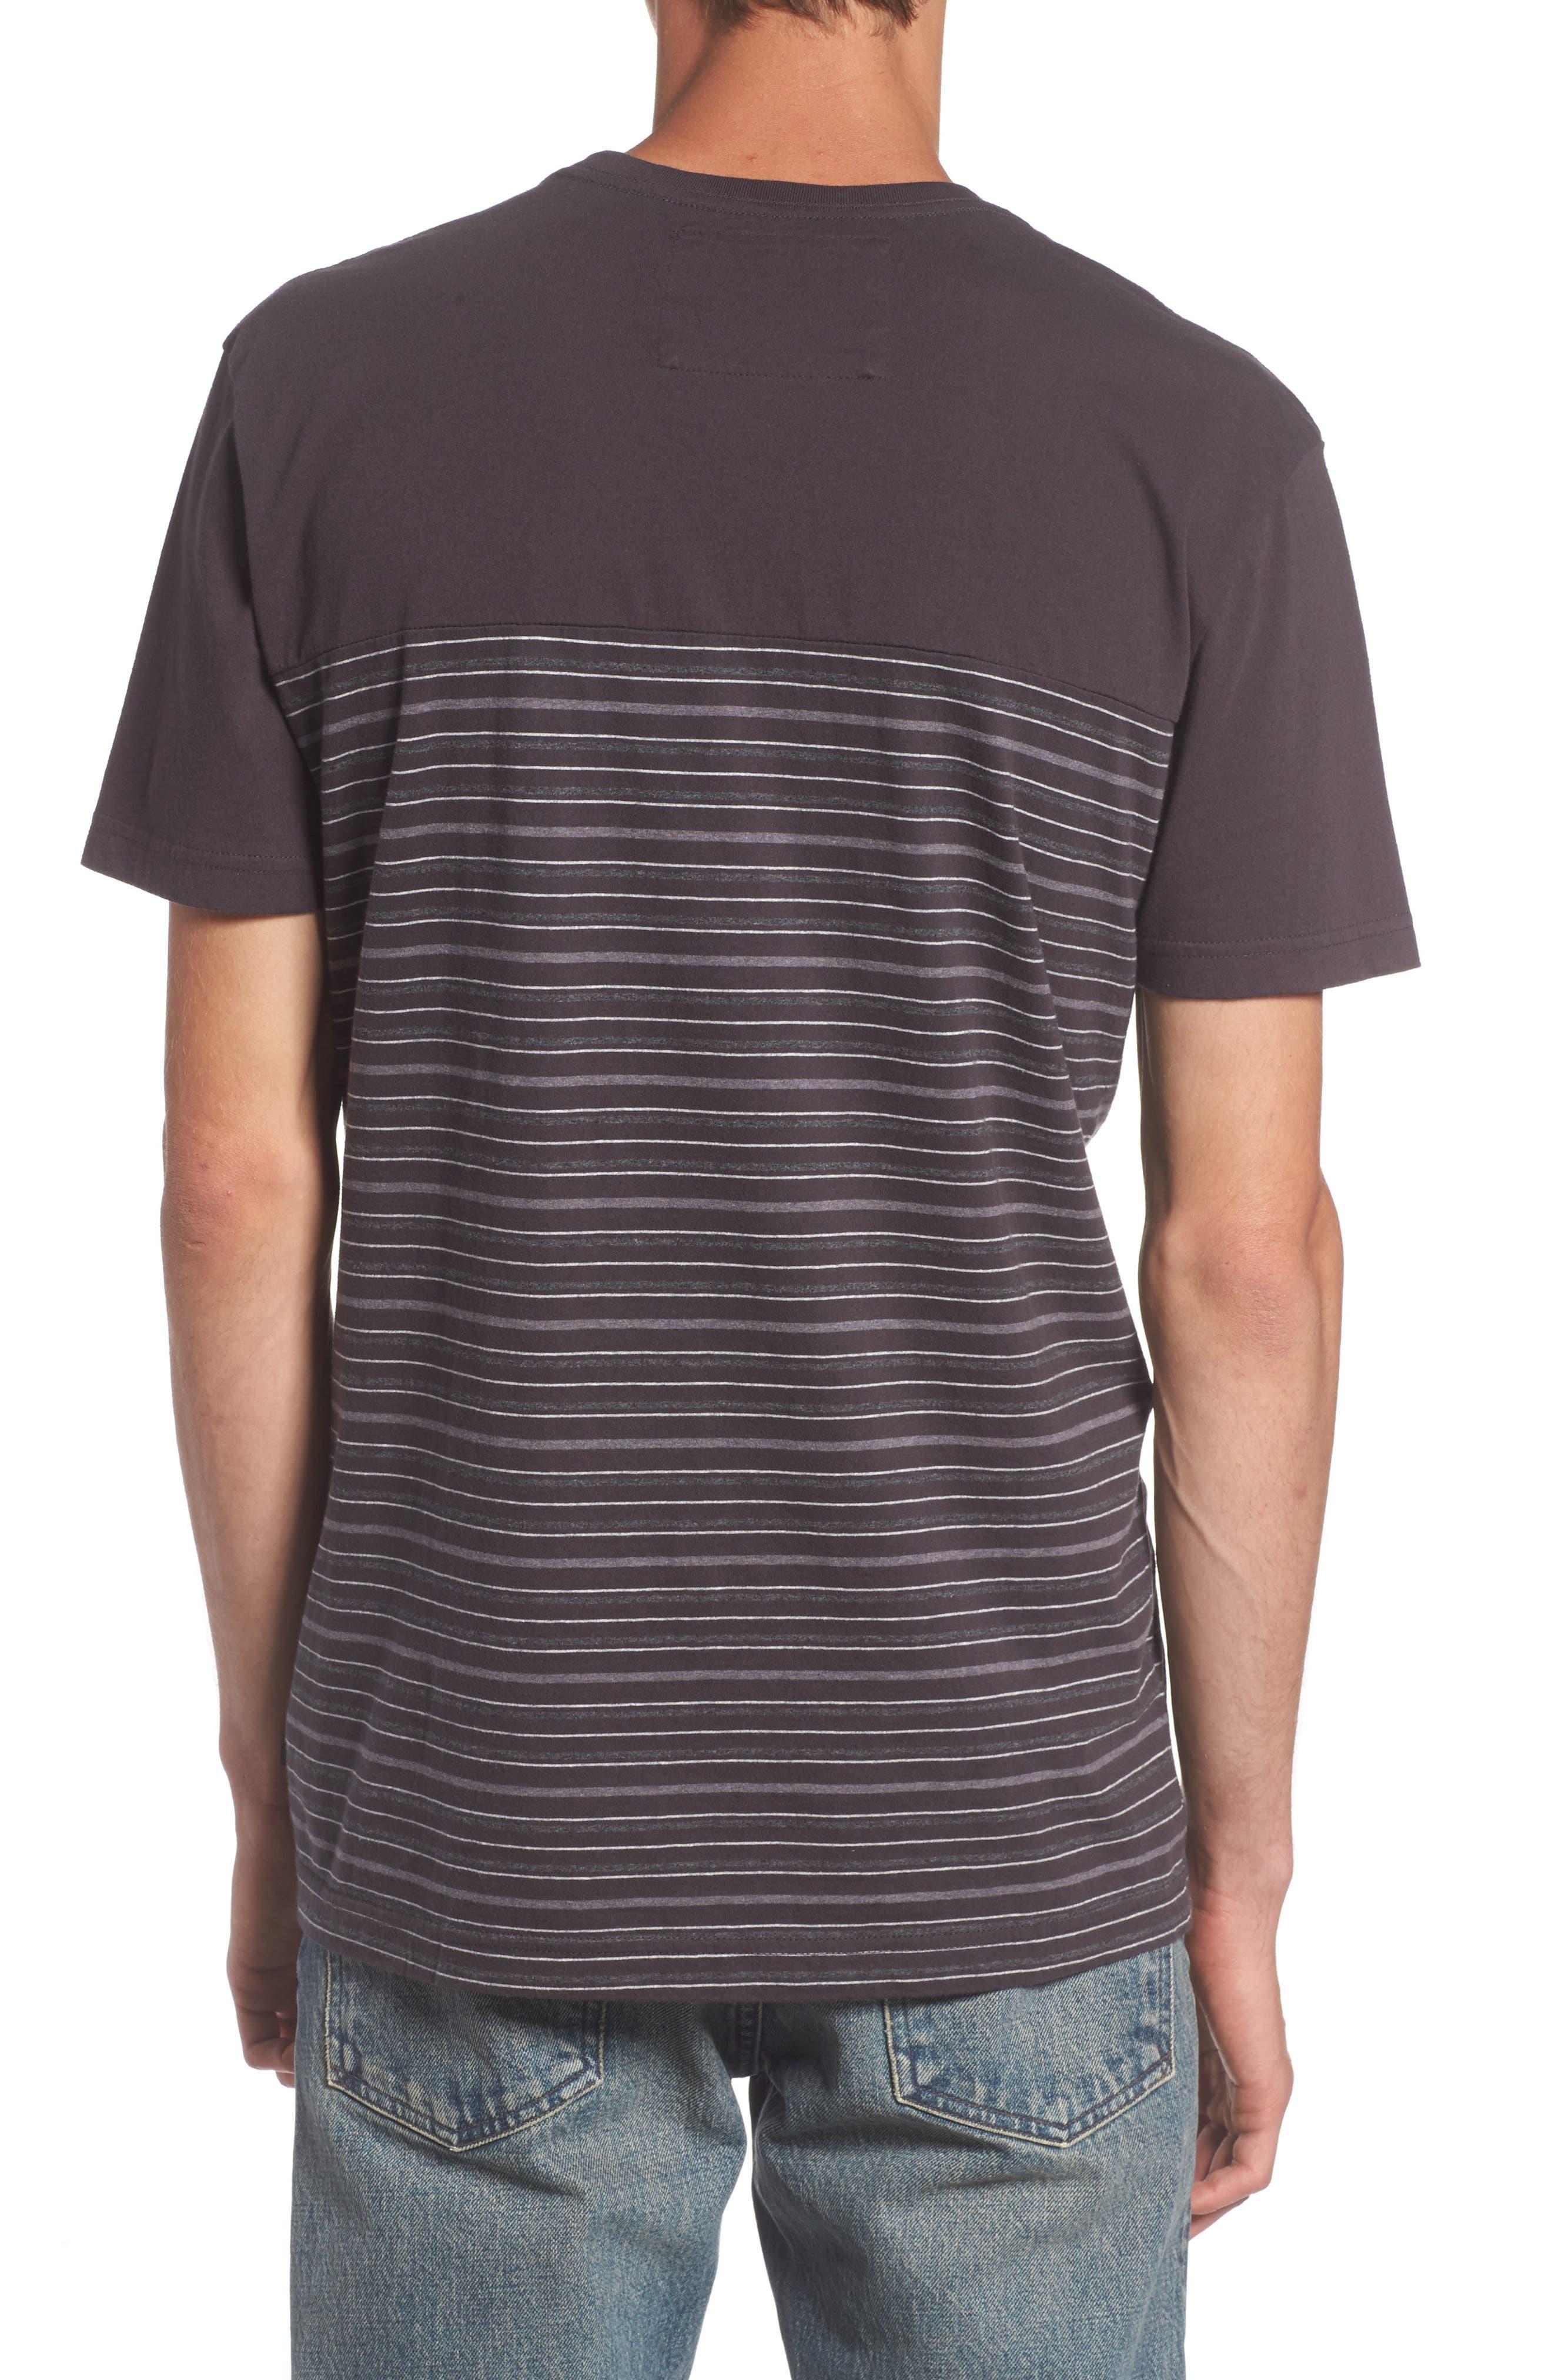 Full Tide T-Shirt,                             Alternate thumbnail 2, color,                             005